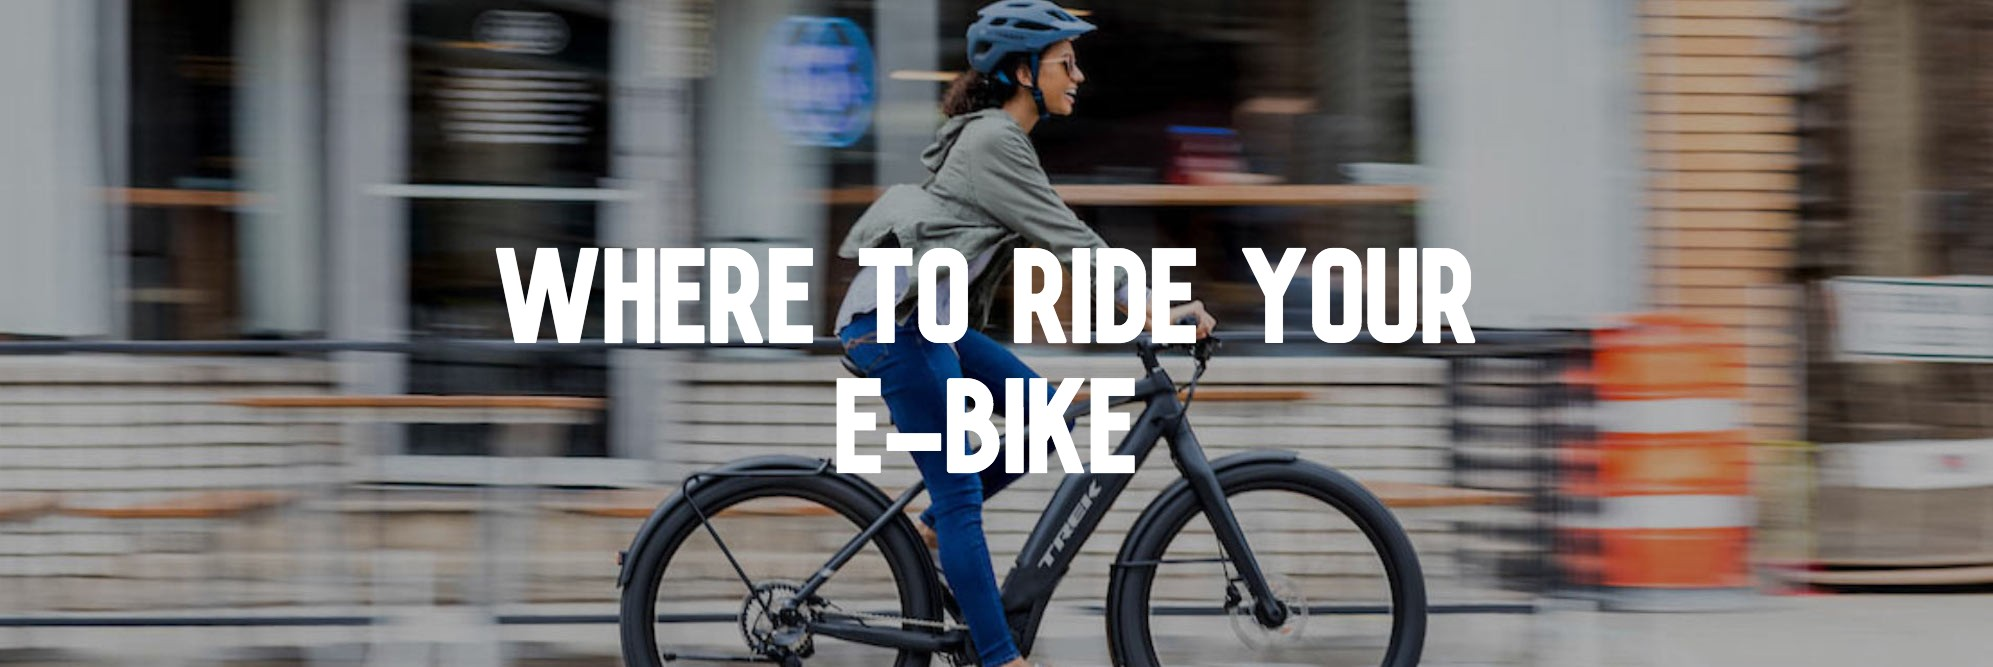 Where to ride your e-bike , Omaha & Lincoln NE